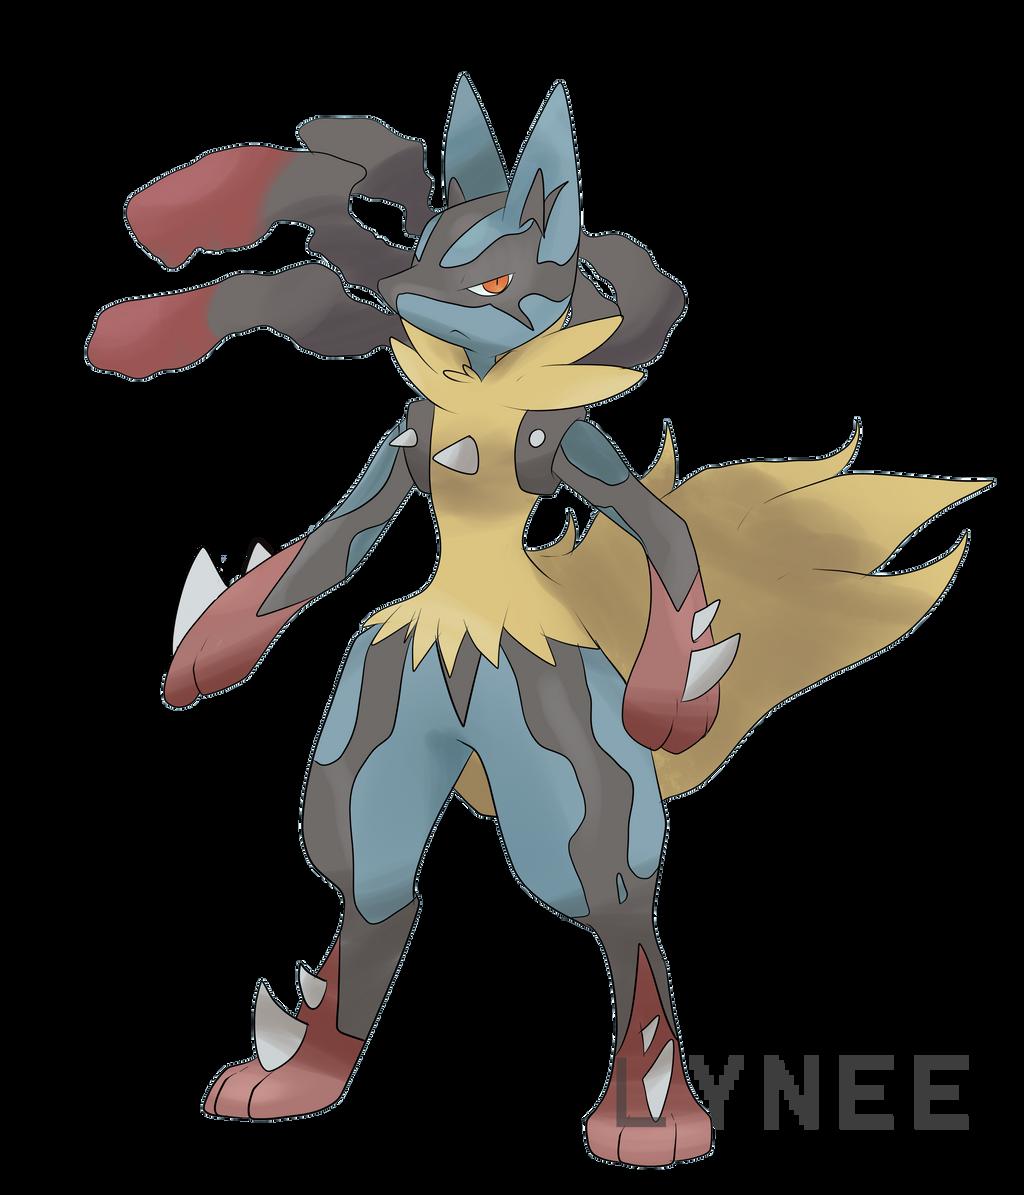 Mega lucario by lyneee on deviantart - Pokemon tortank mega evolution ...